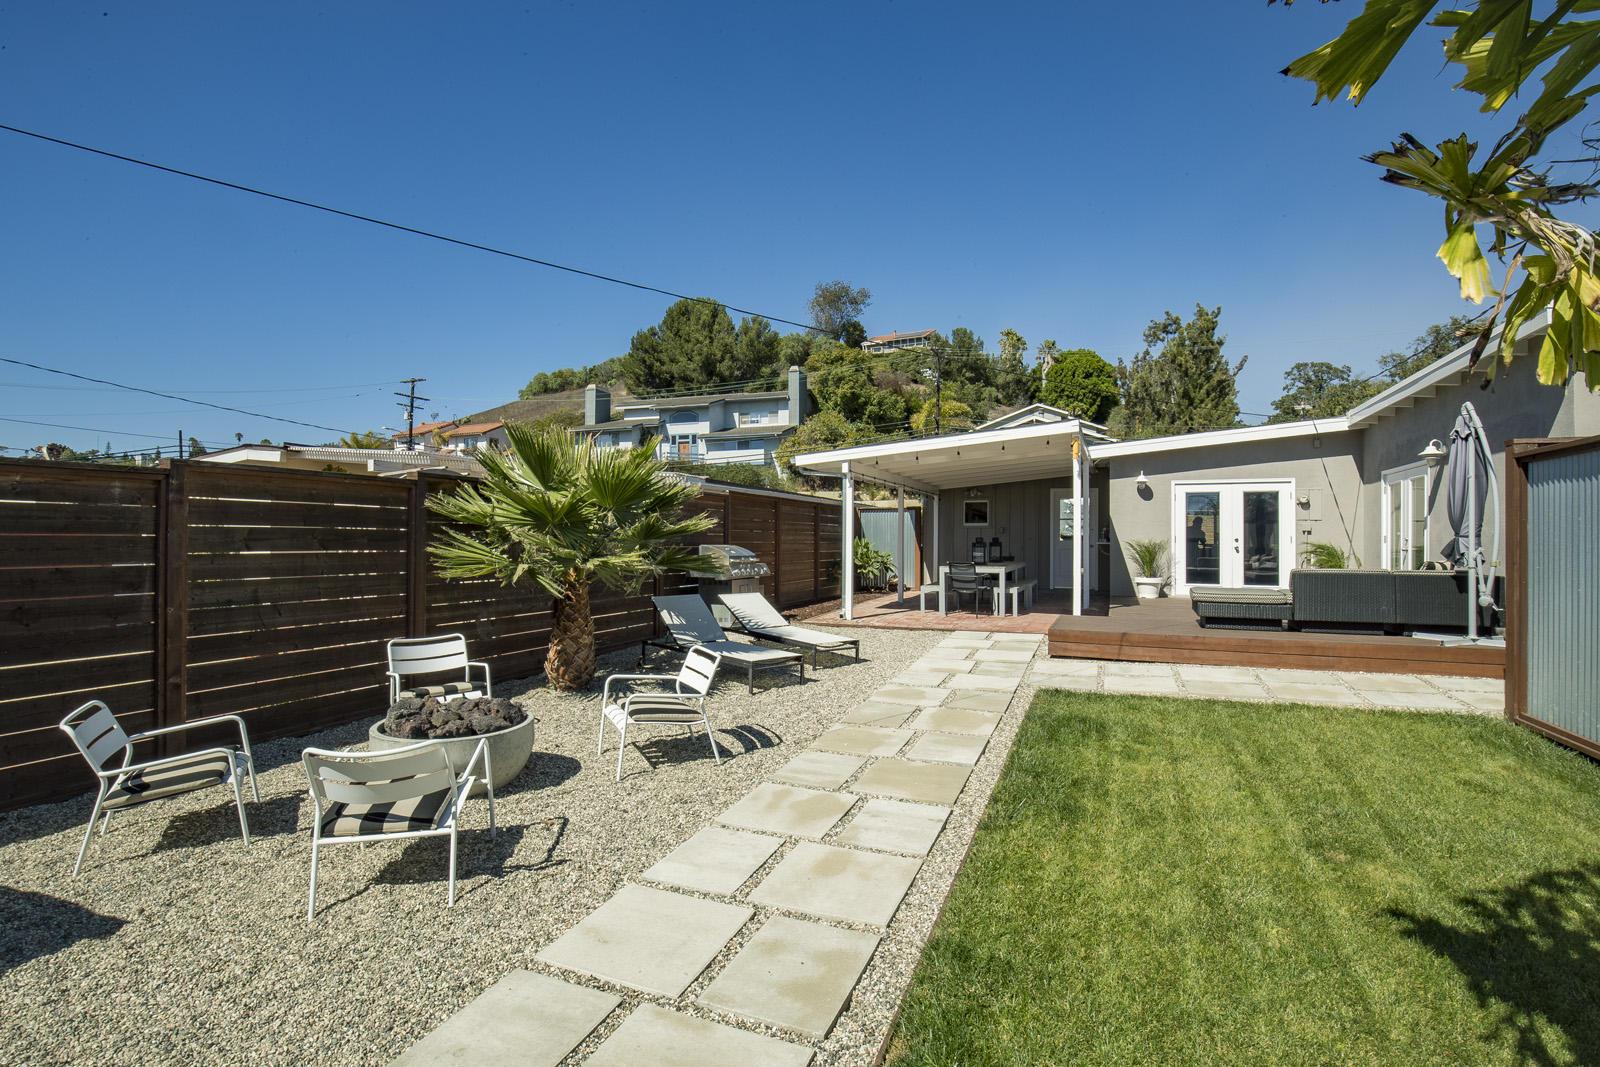 Property photo for 452 Fellowship Rd Santa Barbara, California 93109 - 16-3054